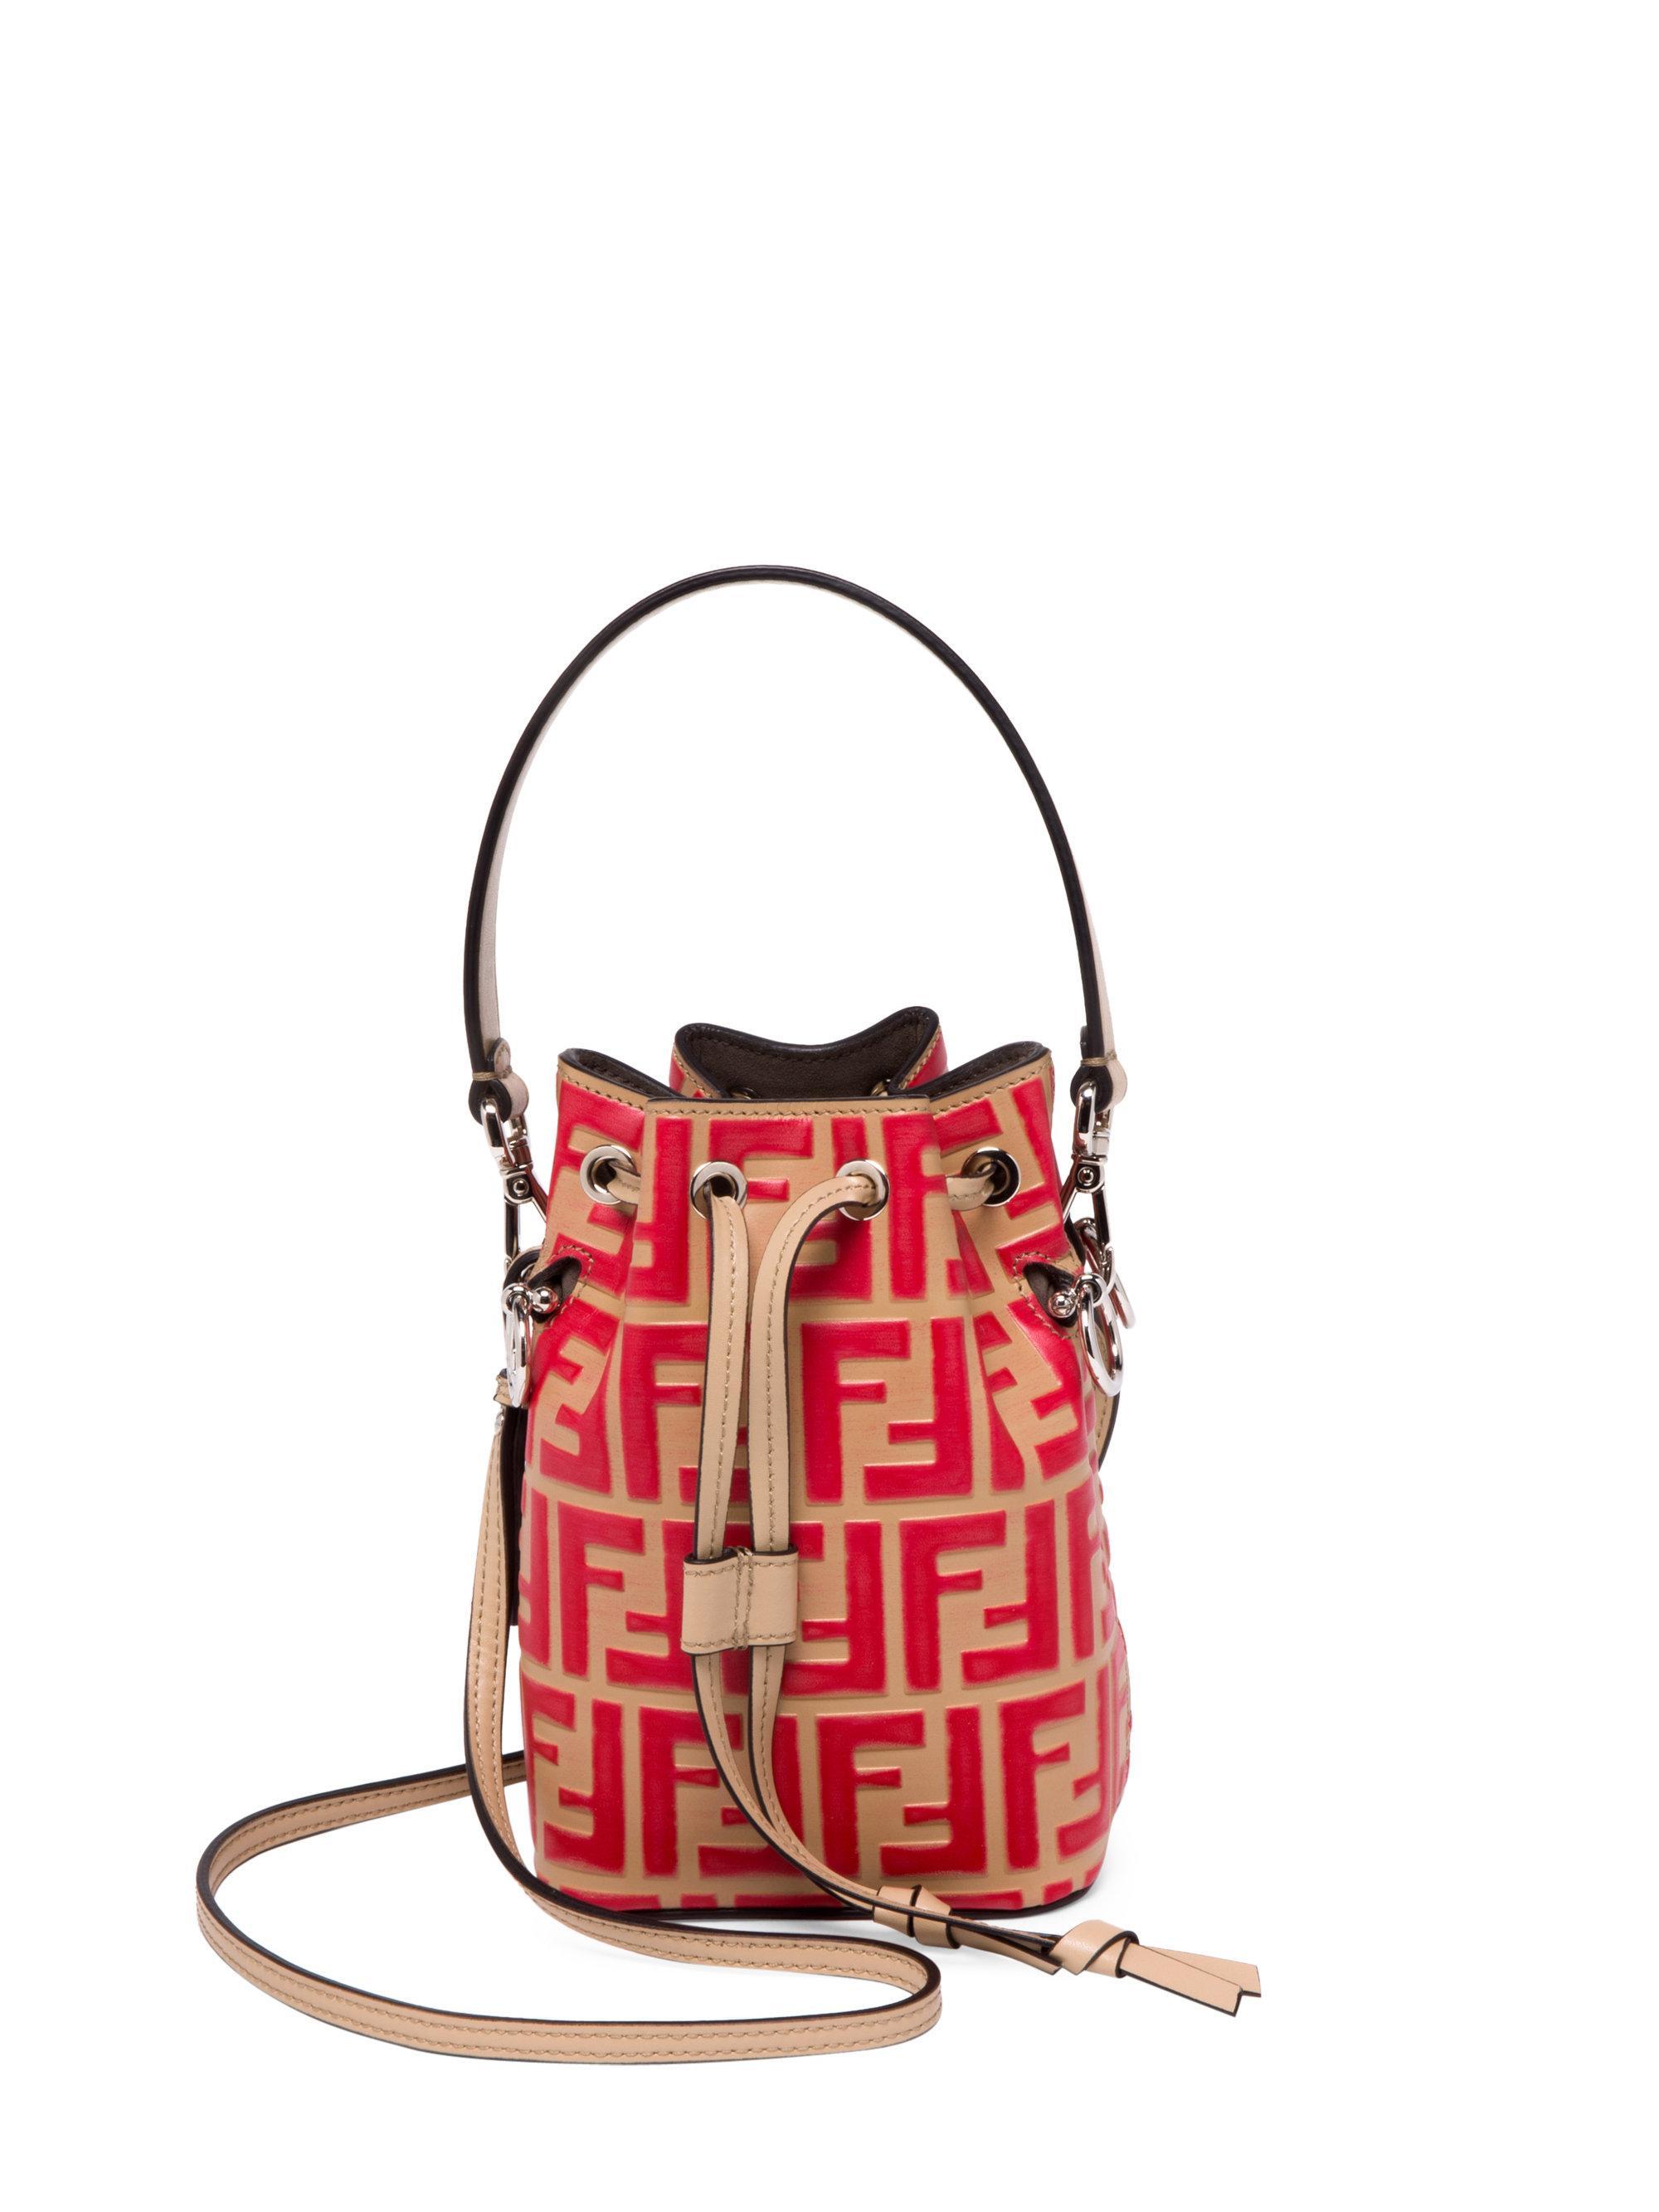 d34f7326494e Fendi Red Strap Bag